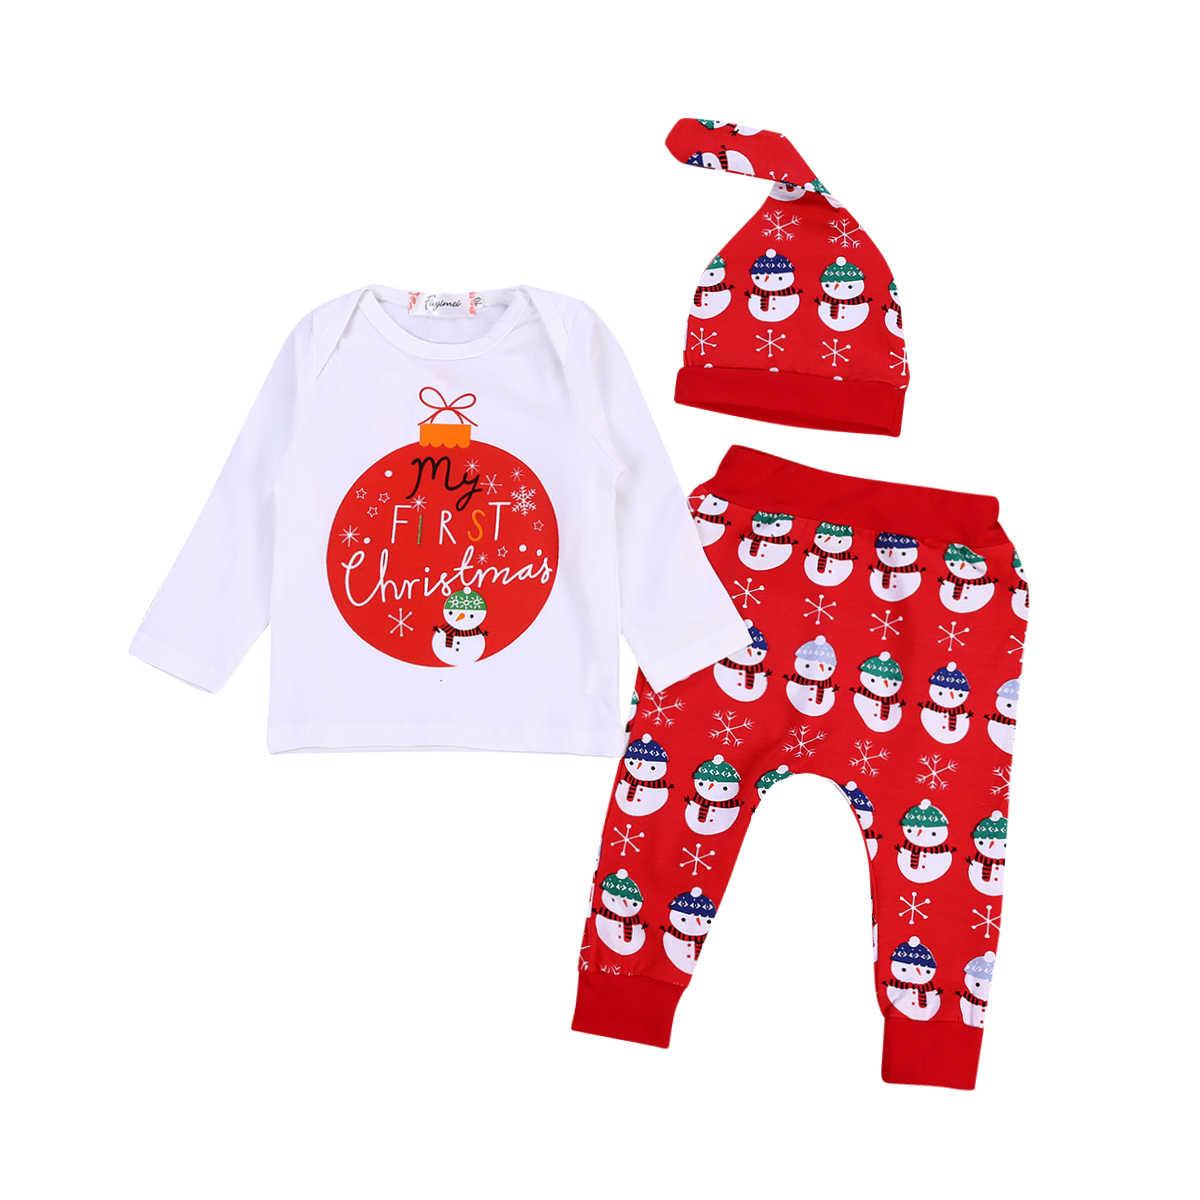 a11391cbf5de4f Baby Boys Girls Clothes Set MY FIRST CHRISTMAS Newborn Suits Cute Snowman  Print T-shirts